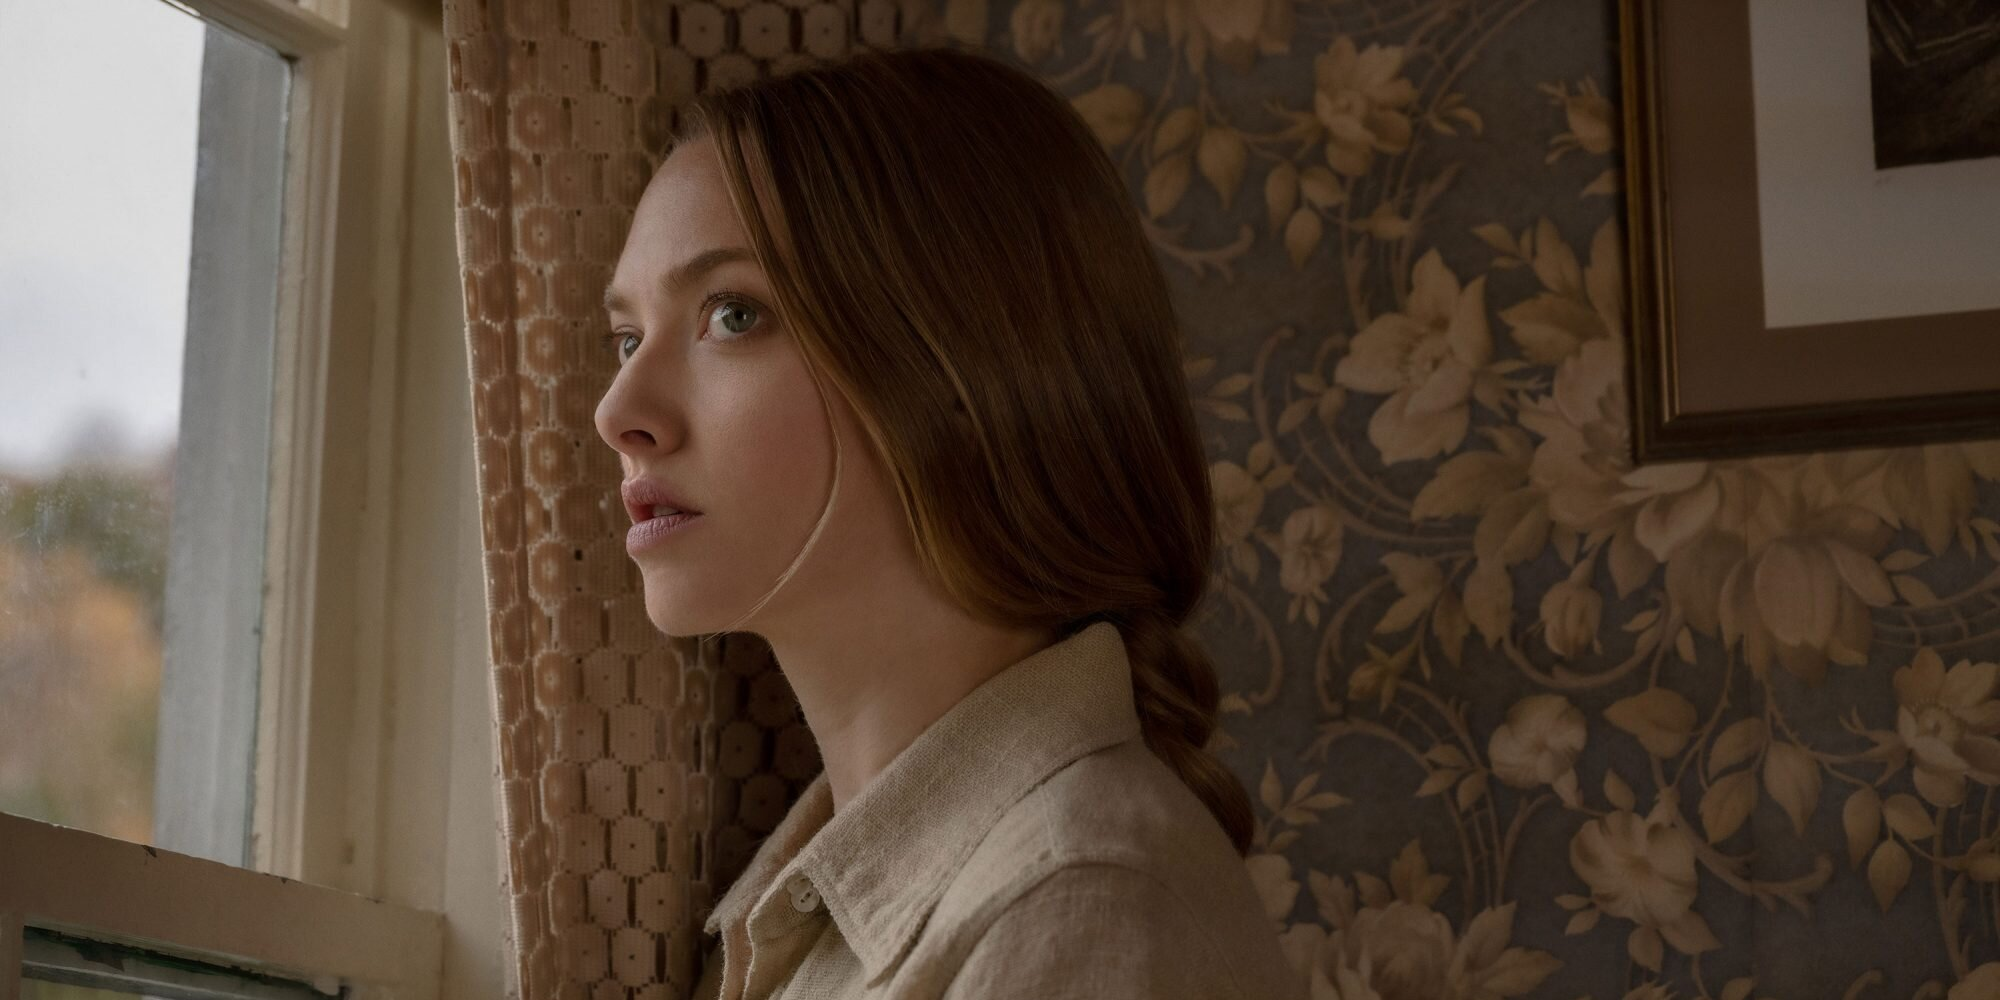 Amanda Seyfriend hrá hlavnú úlohu nového hororu Things Heard and Seen